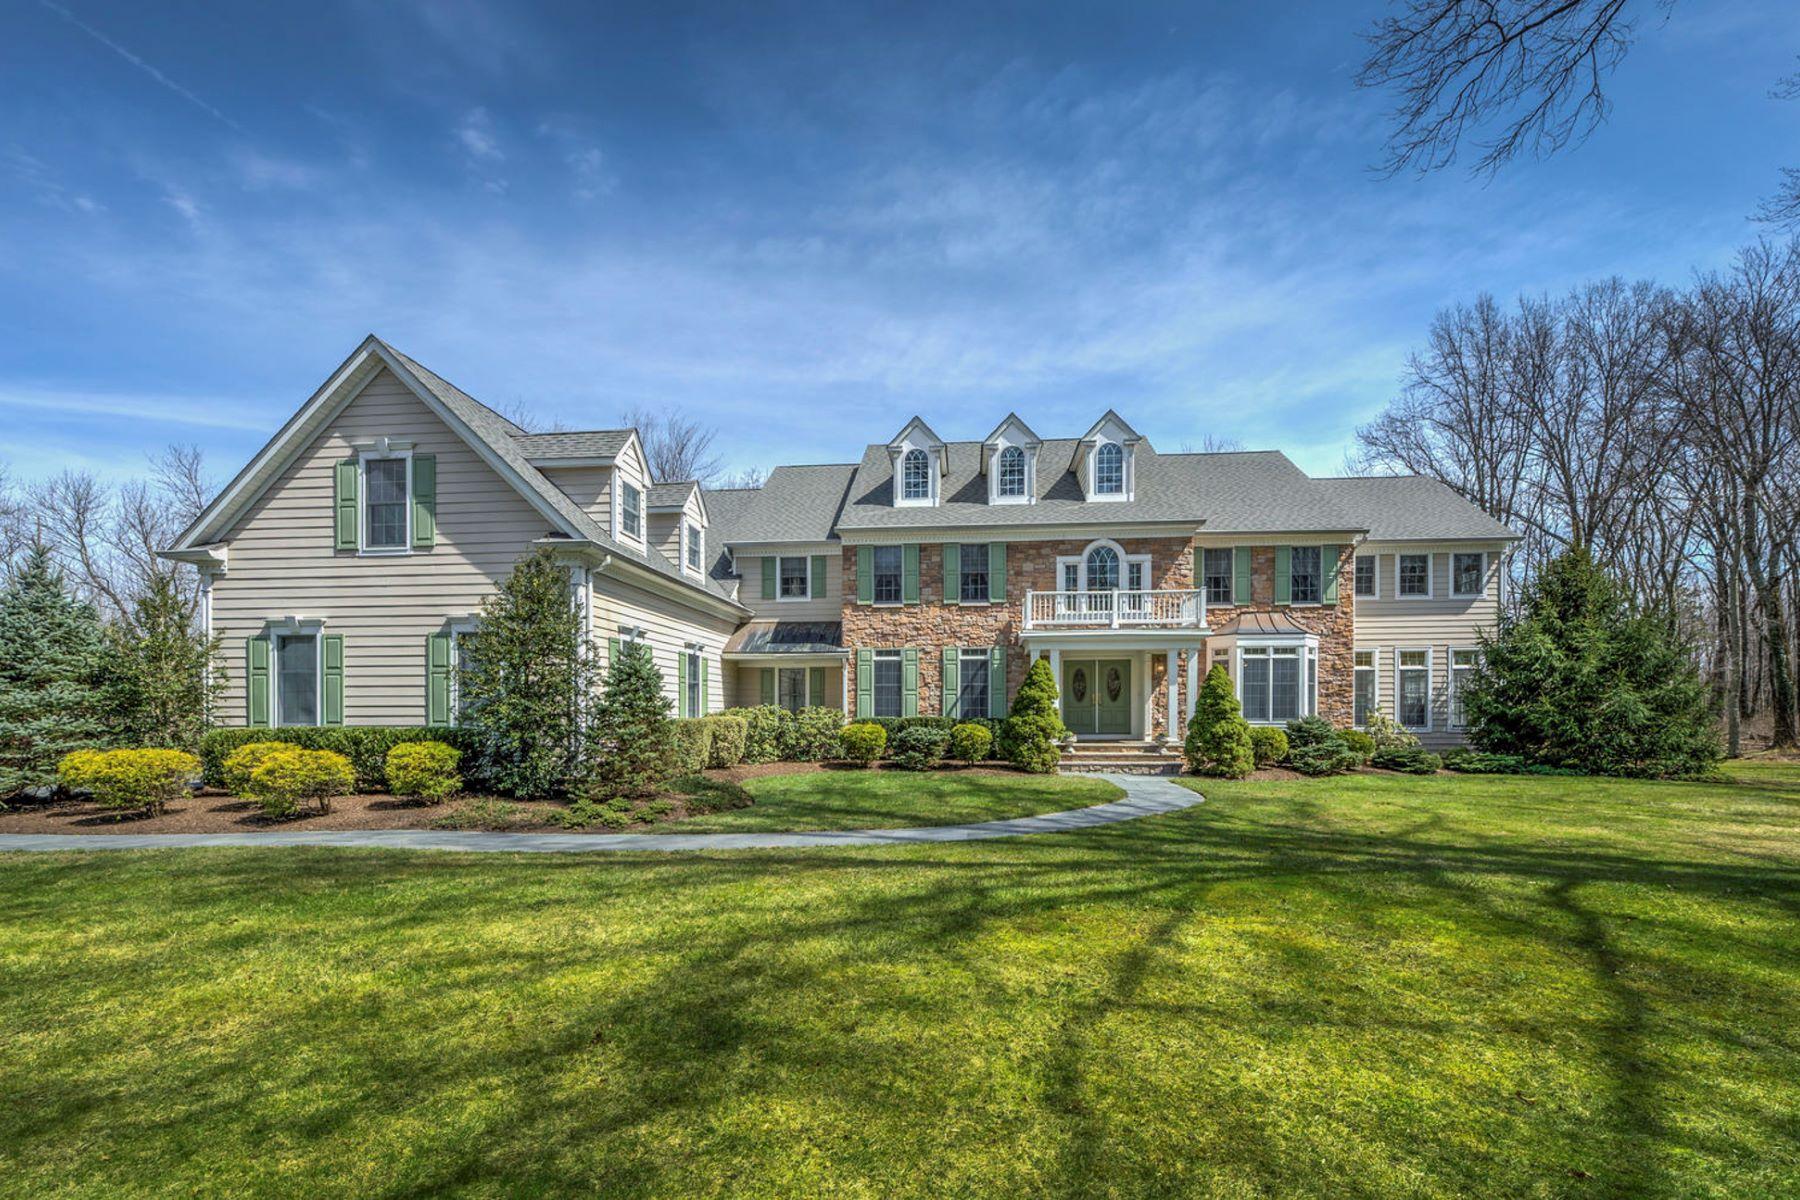 Single Family Homes για την Πώληση στο The Best Of Everyday Life 30 Birchwood Drive, Princeton, Νιου Τζερσεϋ 08540 Ηνωμένες Πολιτείες